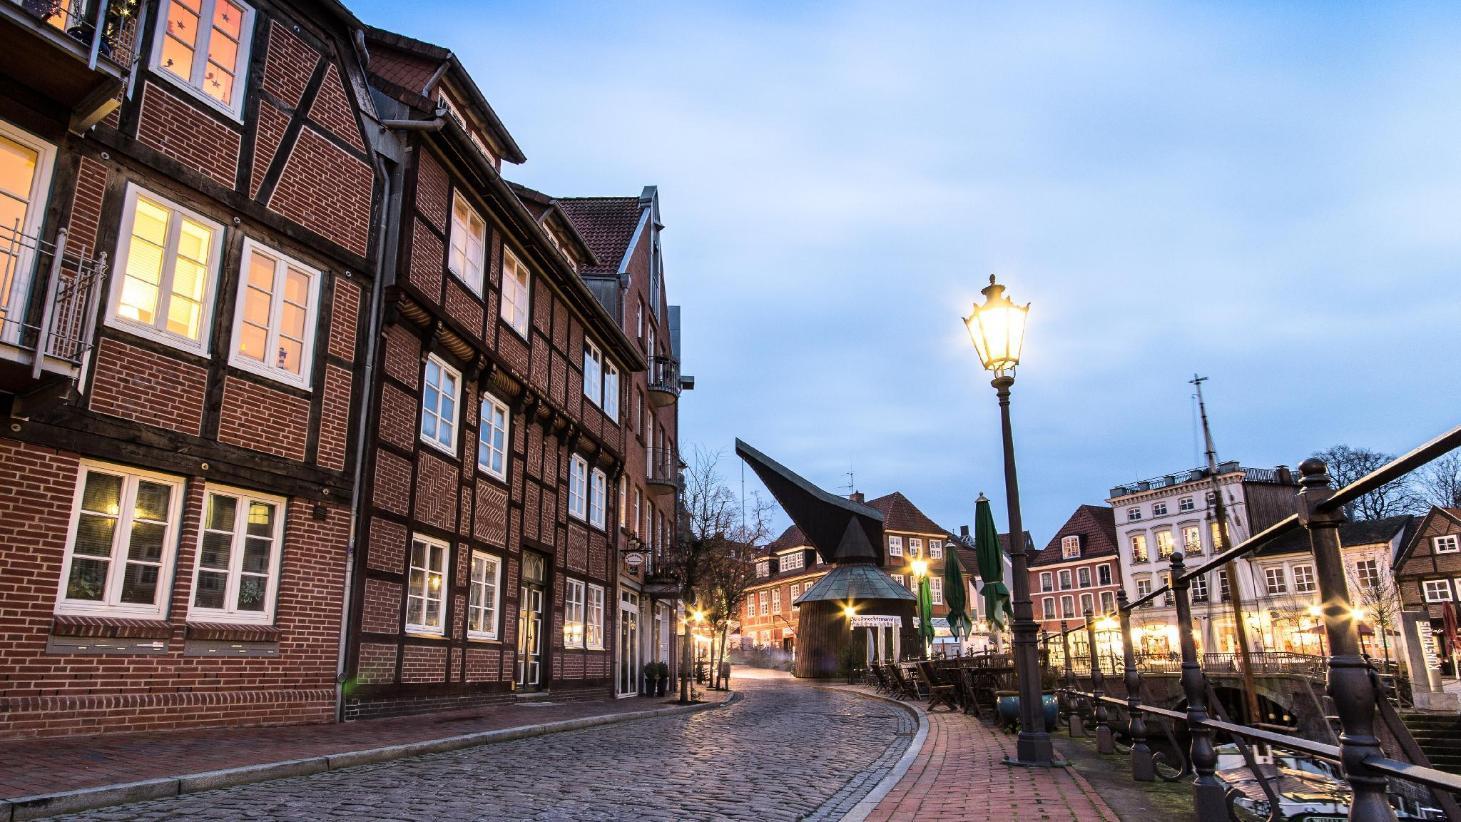 30 Best Stade Hotels In 2020 Great Savings Reviews Of Hotels In Stade Germany